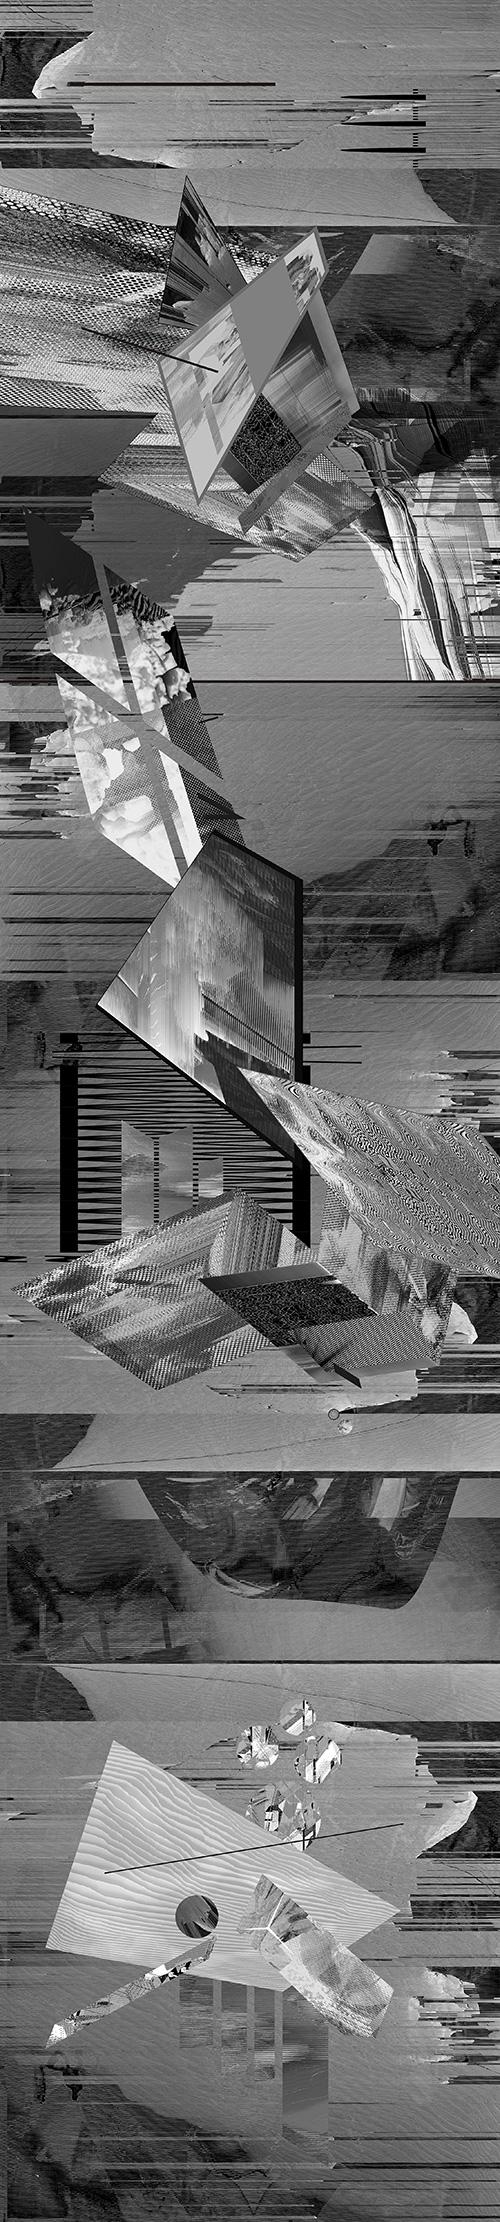 Ewa Doroszenko – Structures of listening - print 01